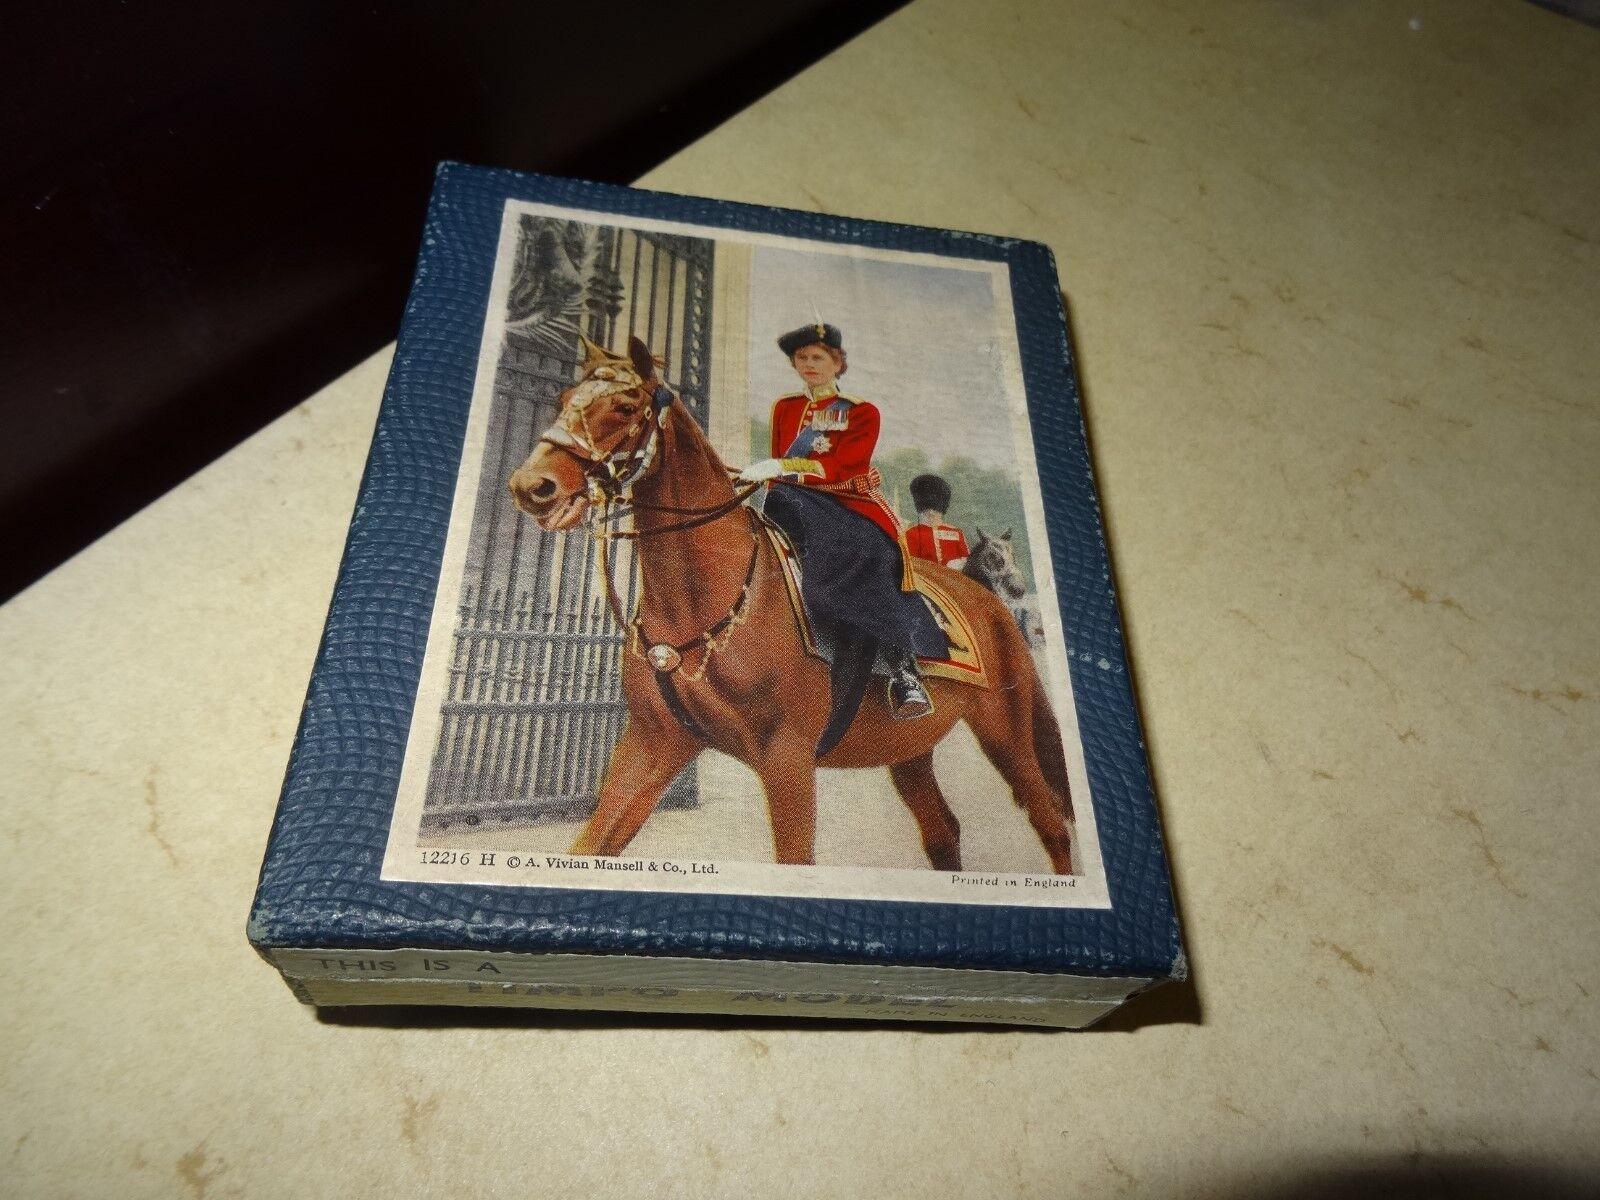 TIMPO  VINTAGE 1953 BOXED LEAD QUEEN ELIZABETH II MOUNTED FIGURE